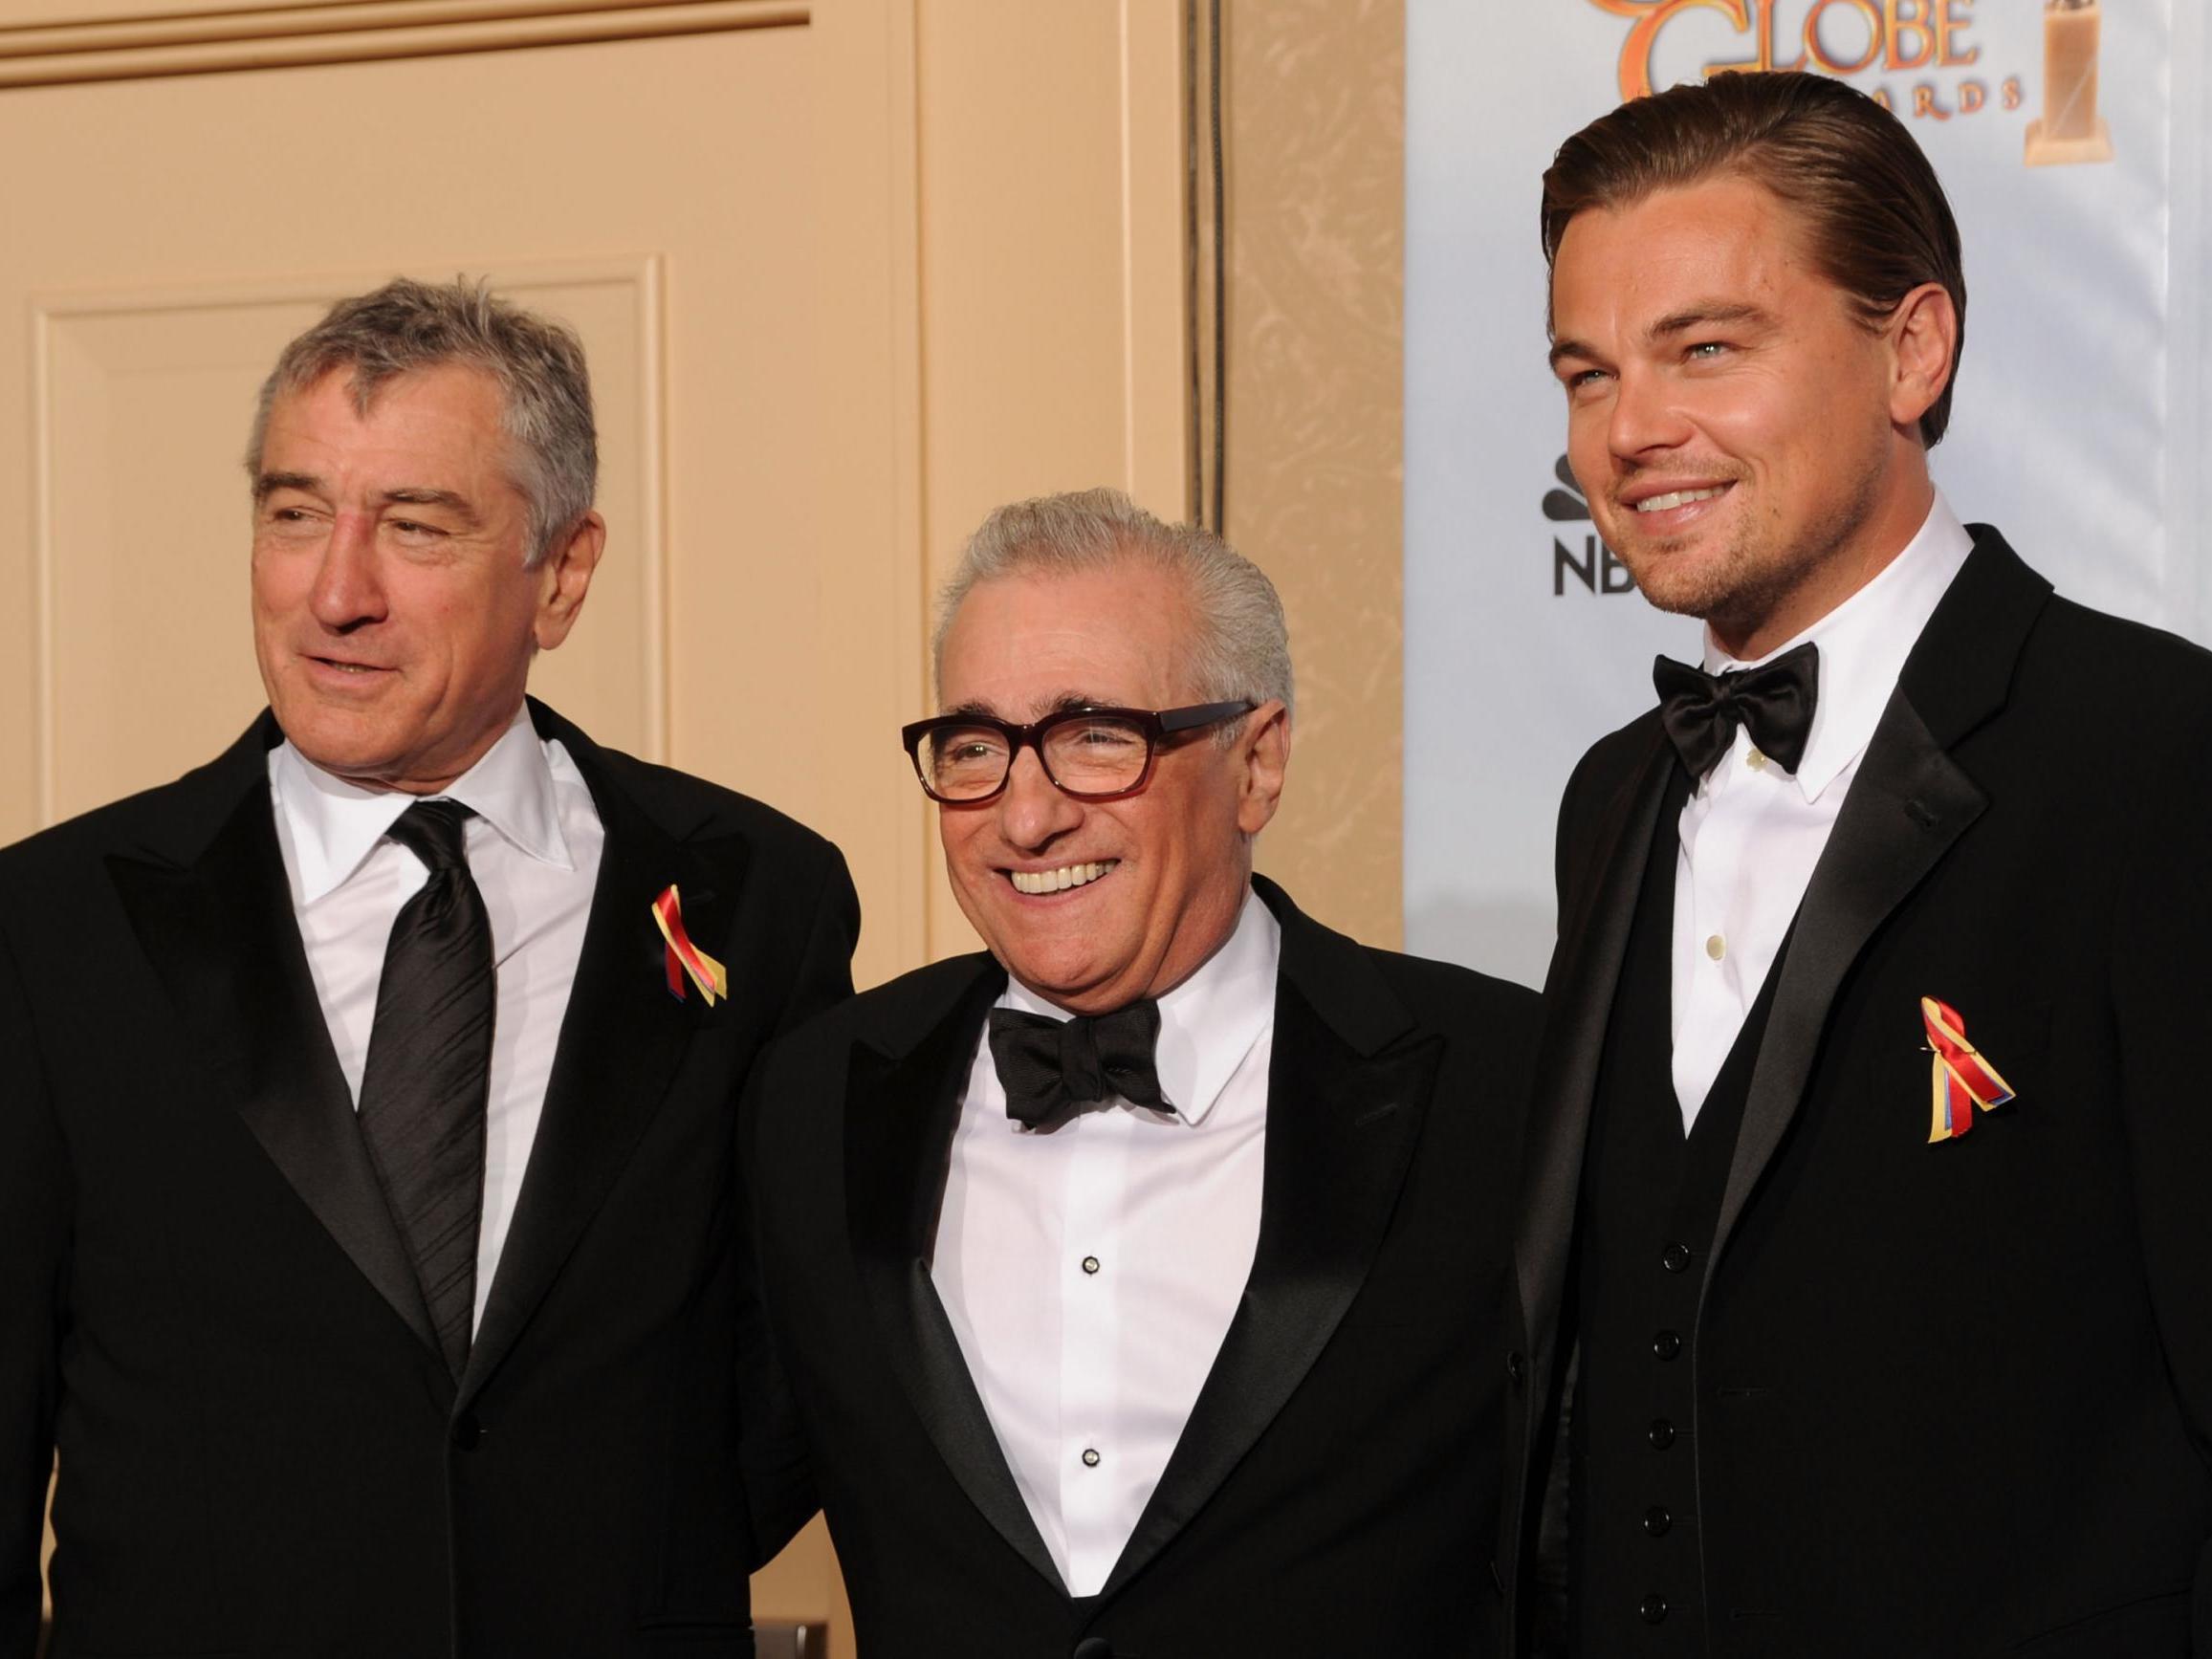 Killers of the Flower Moon: Martin Scorsese to reunite with Robert De Niro on serial killer film